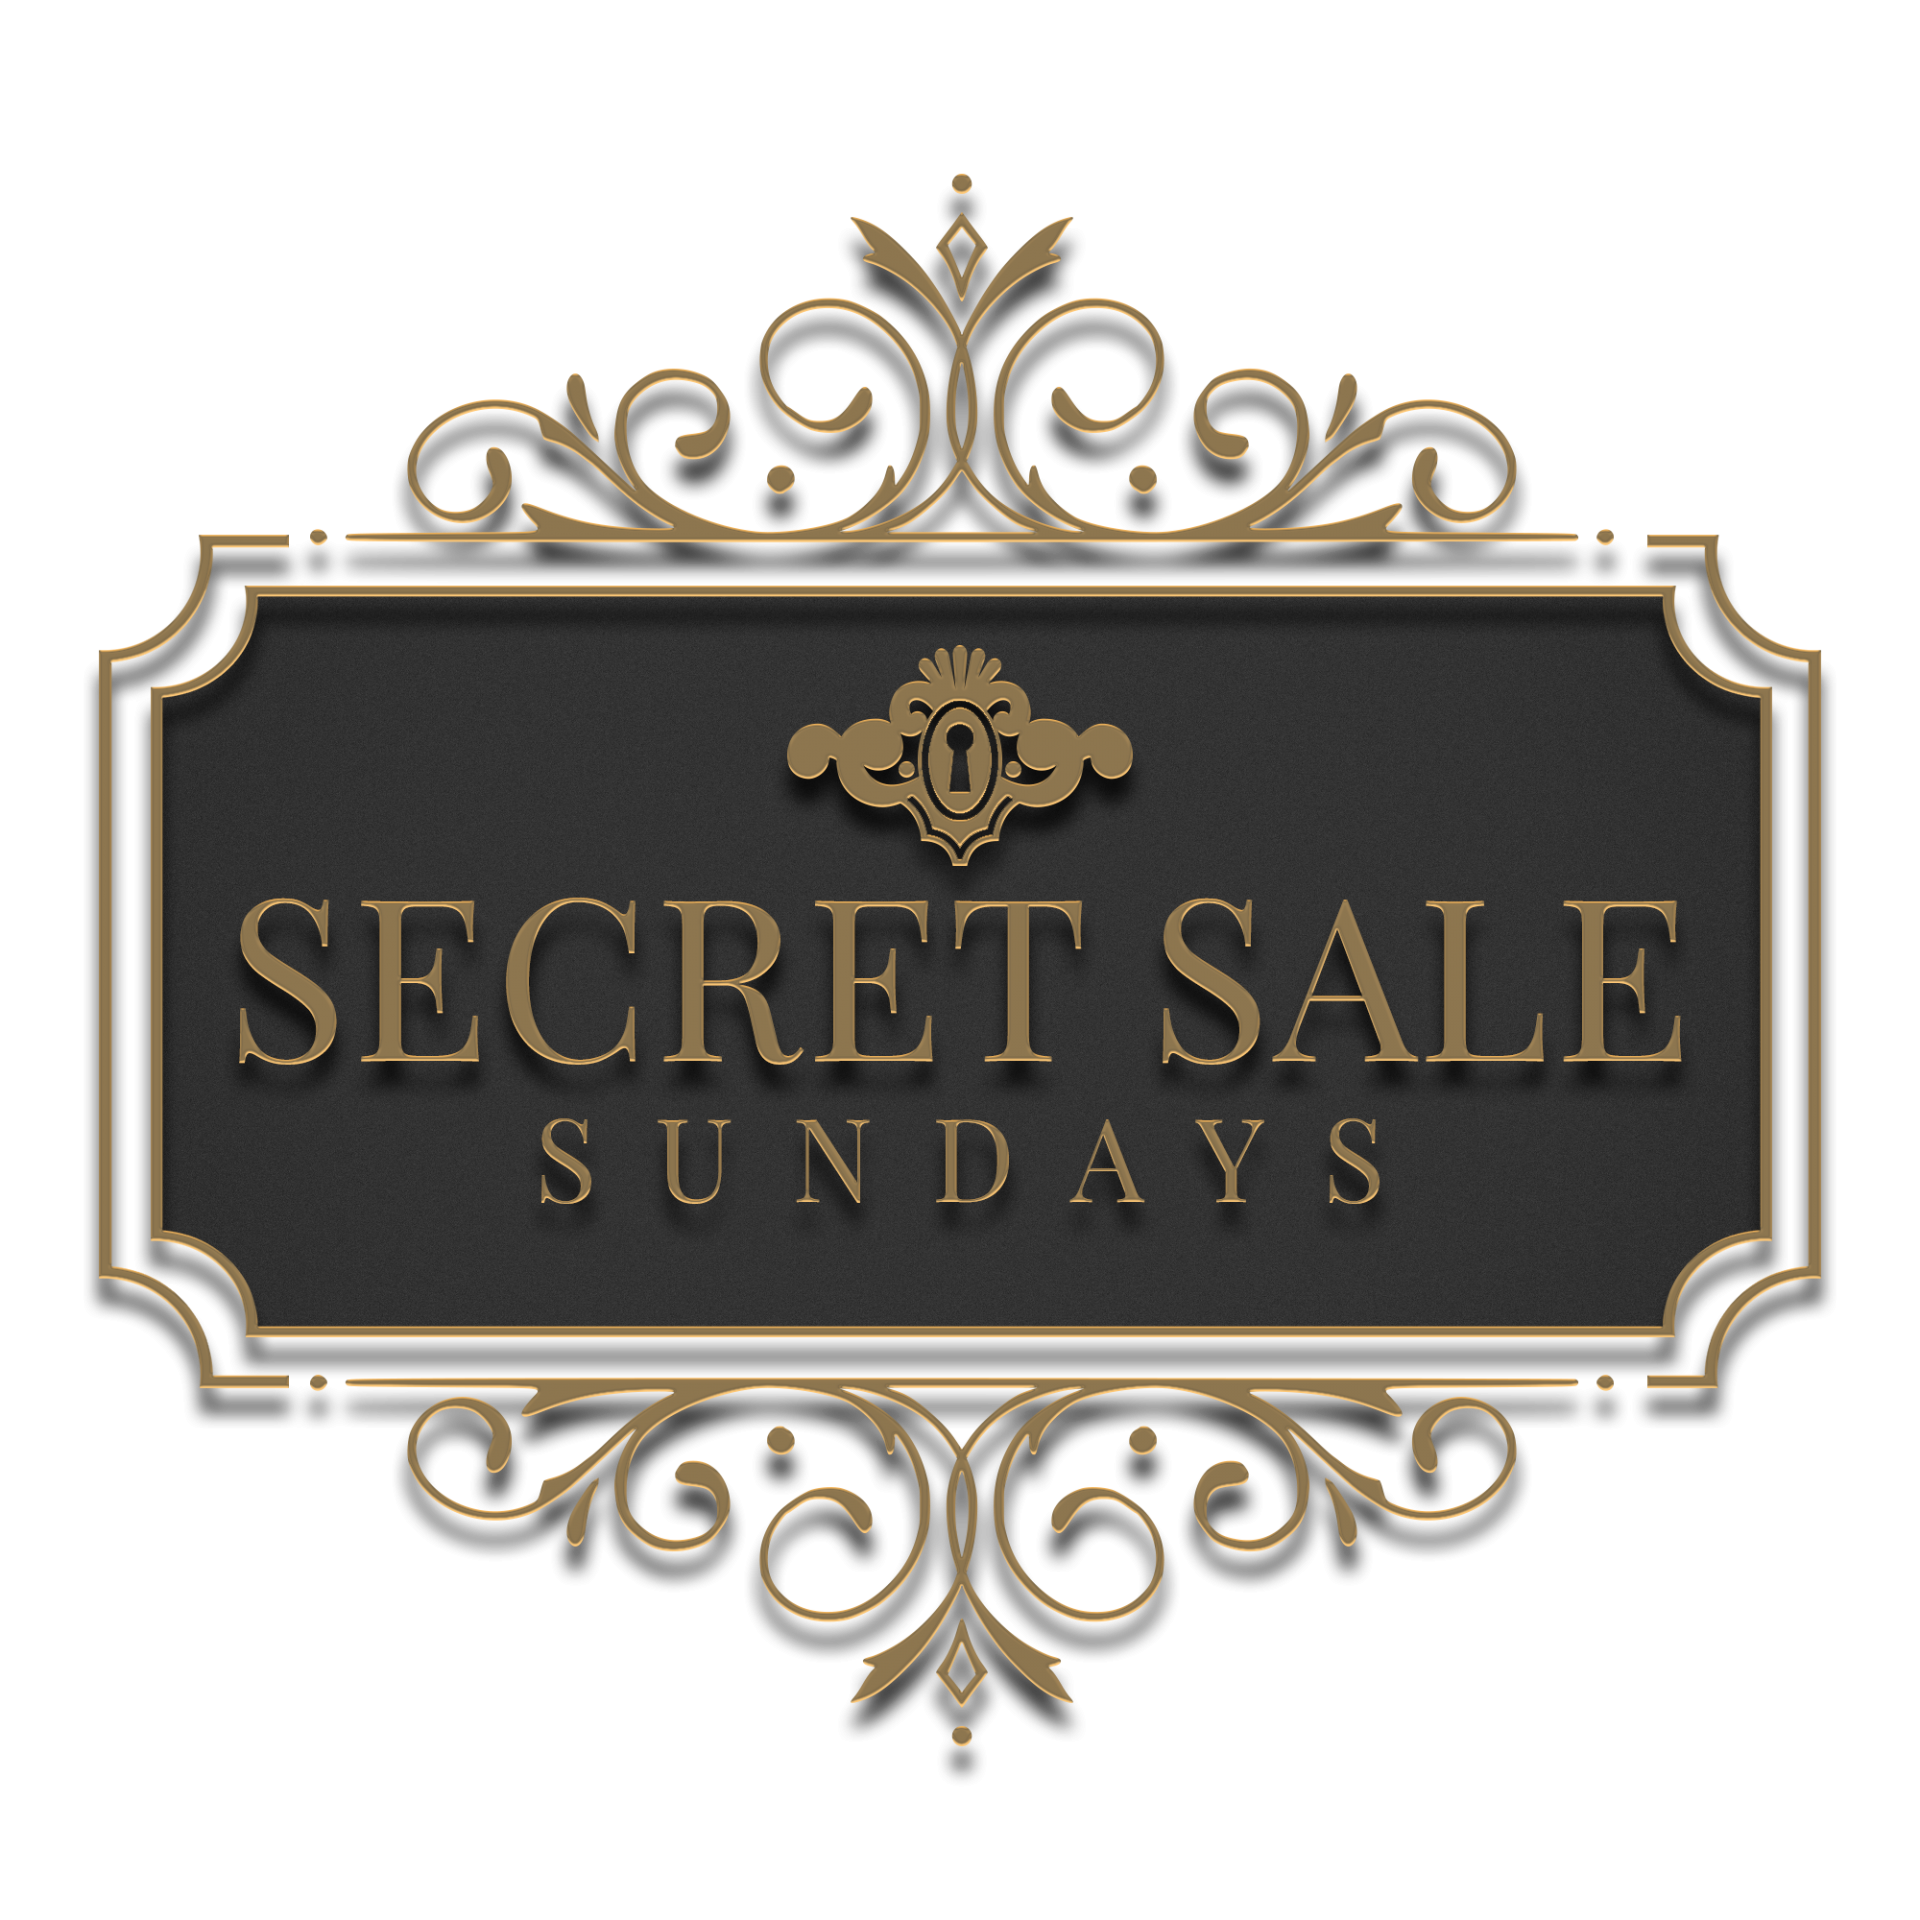 Secret Sale Sundays January 24th 2021